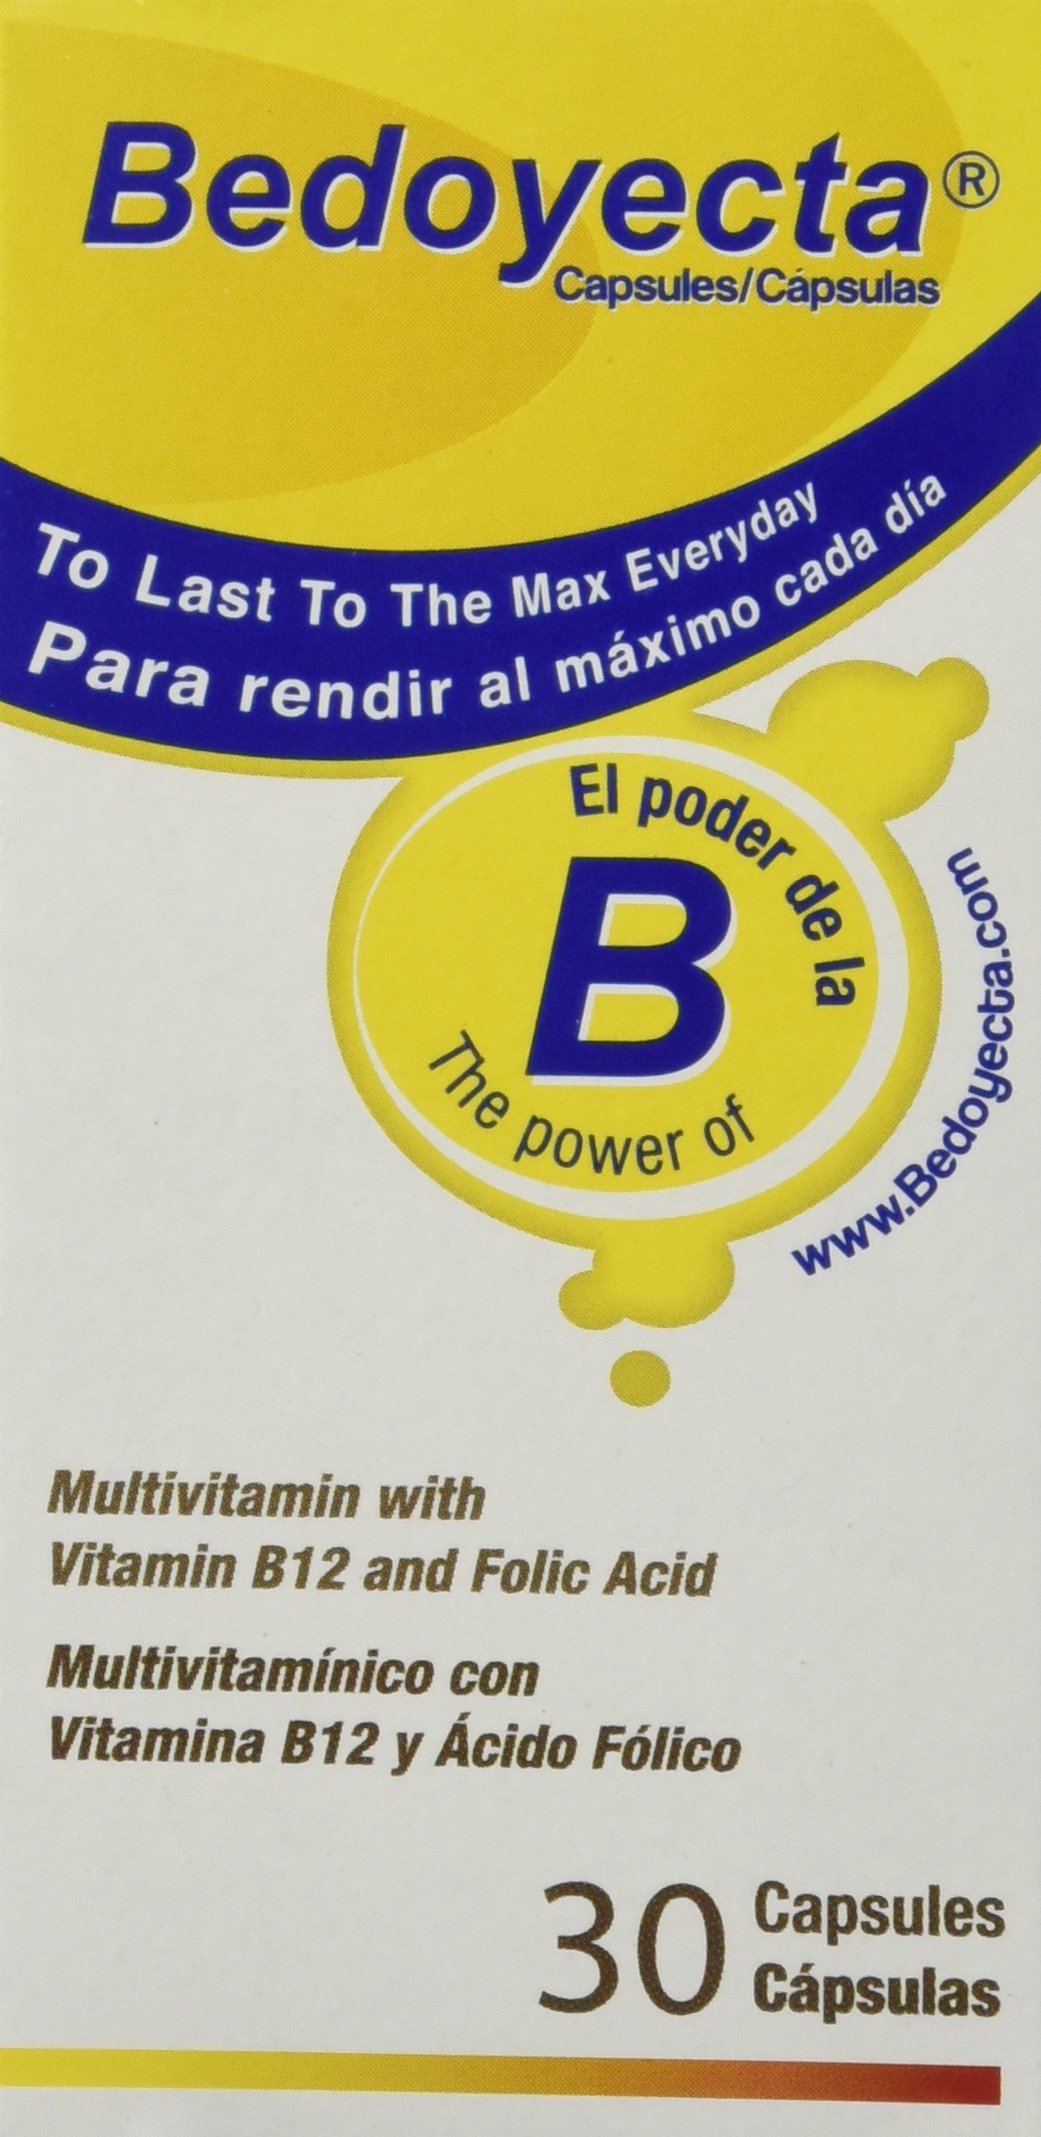 Bedoyecta Multi-Vitamin Capsules, 30 Count